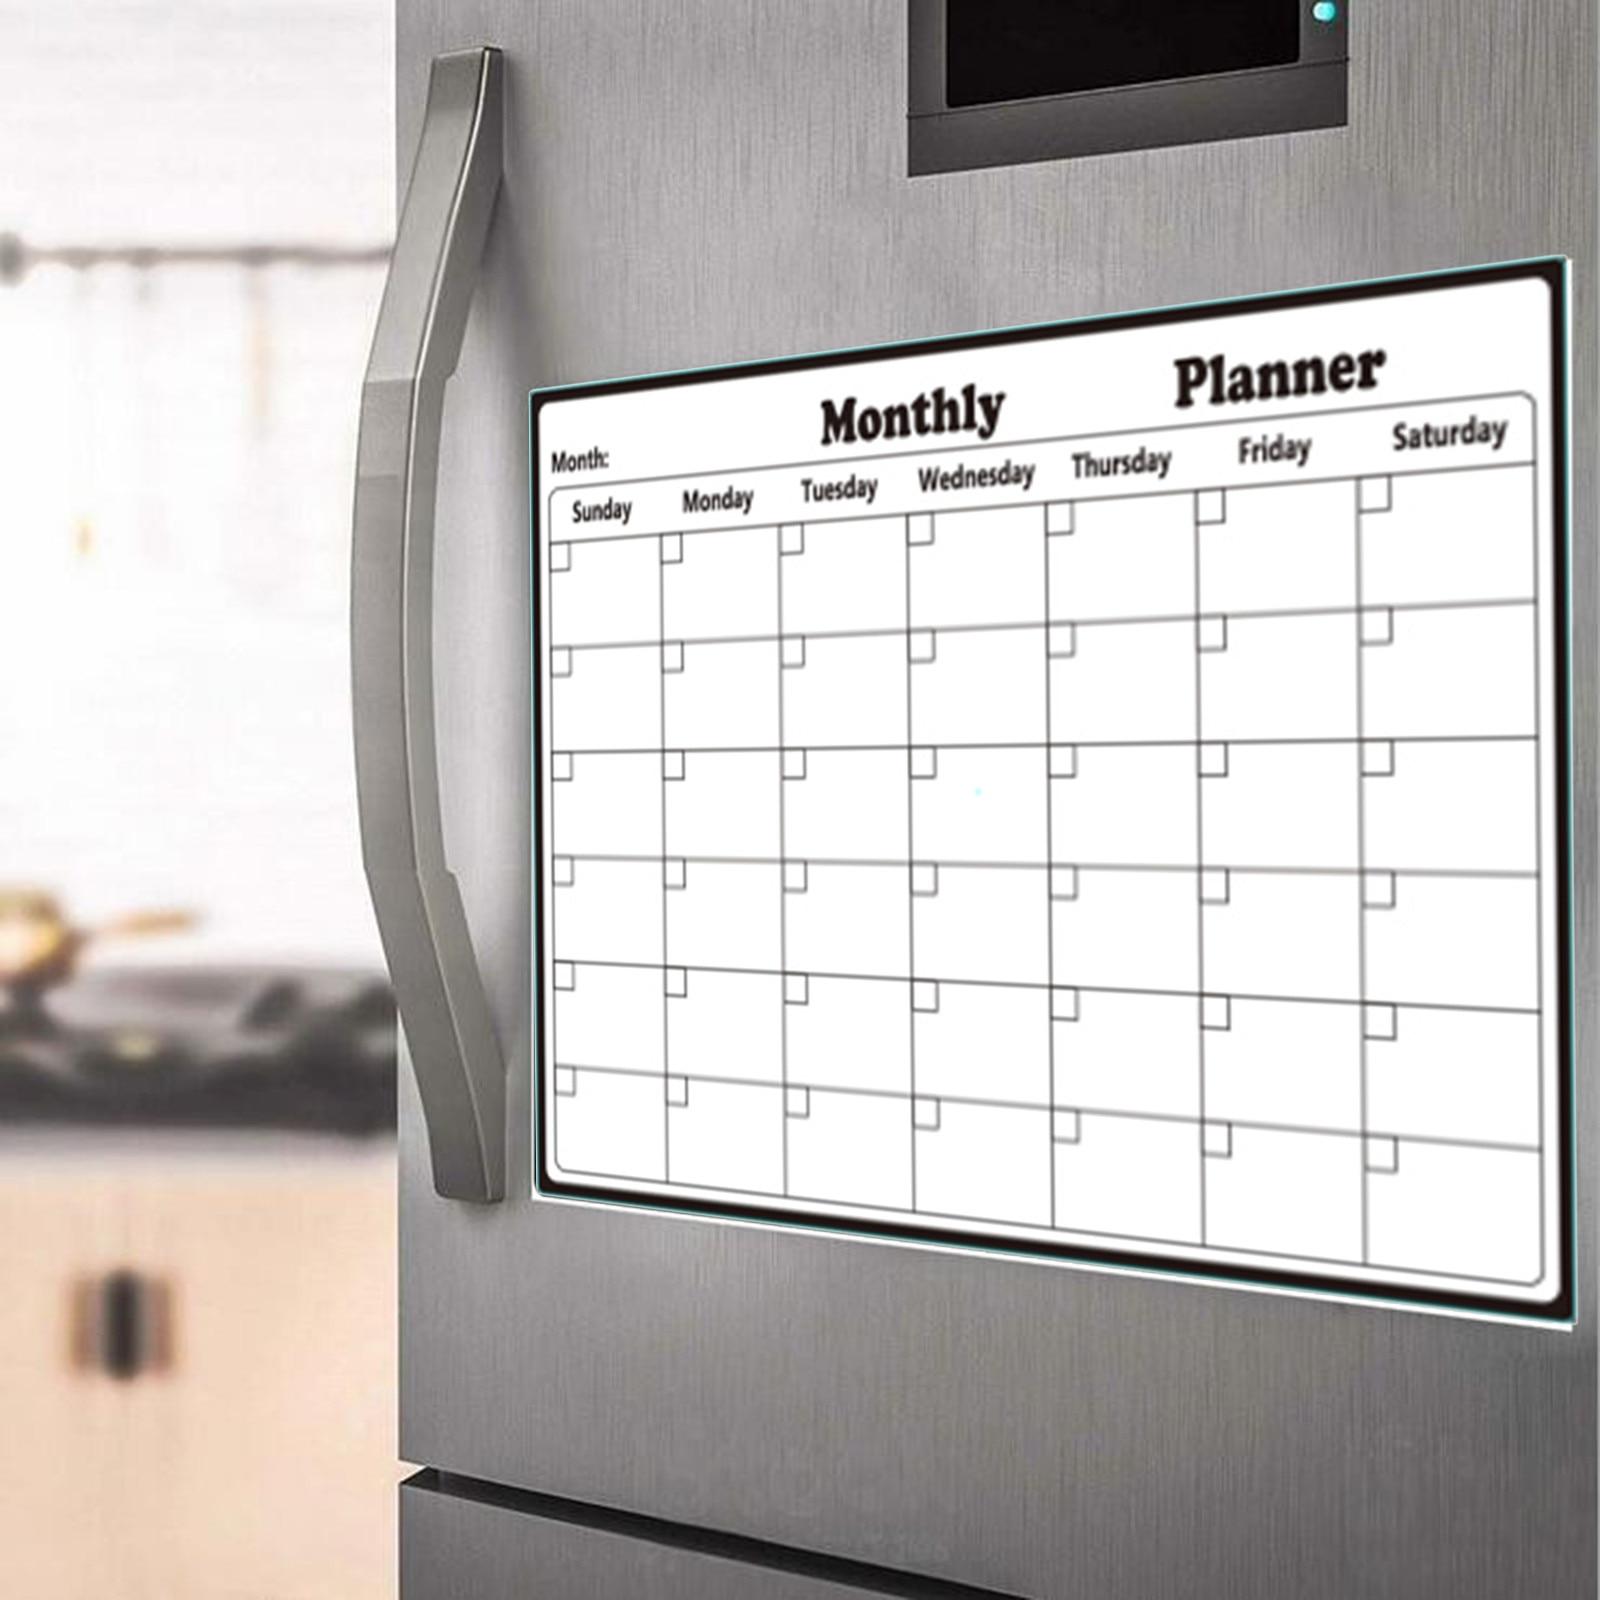 Simple Magnetic Dry Erased Refrigerator Whiteboard Kitchen Fridge Calendar Message Board Student Kids Monthly Planner Board #5